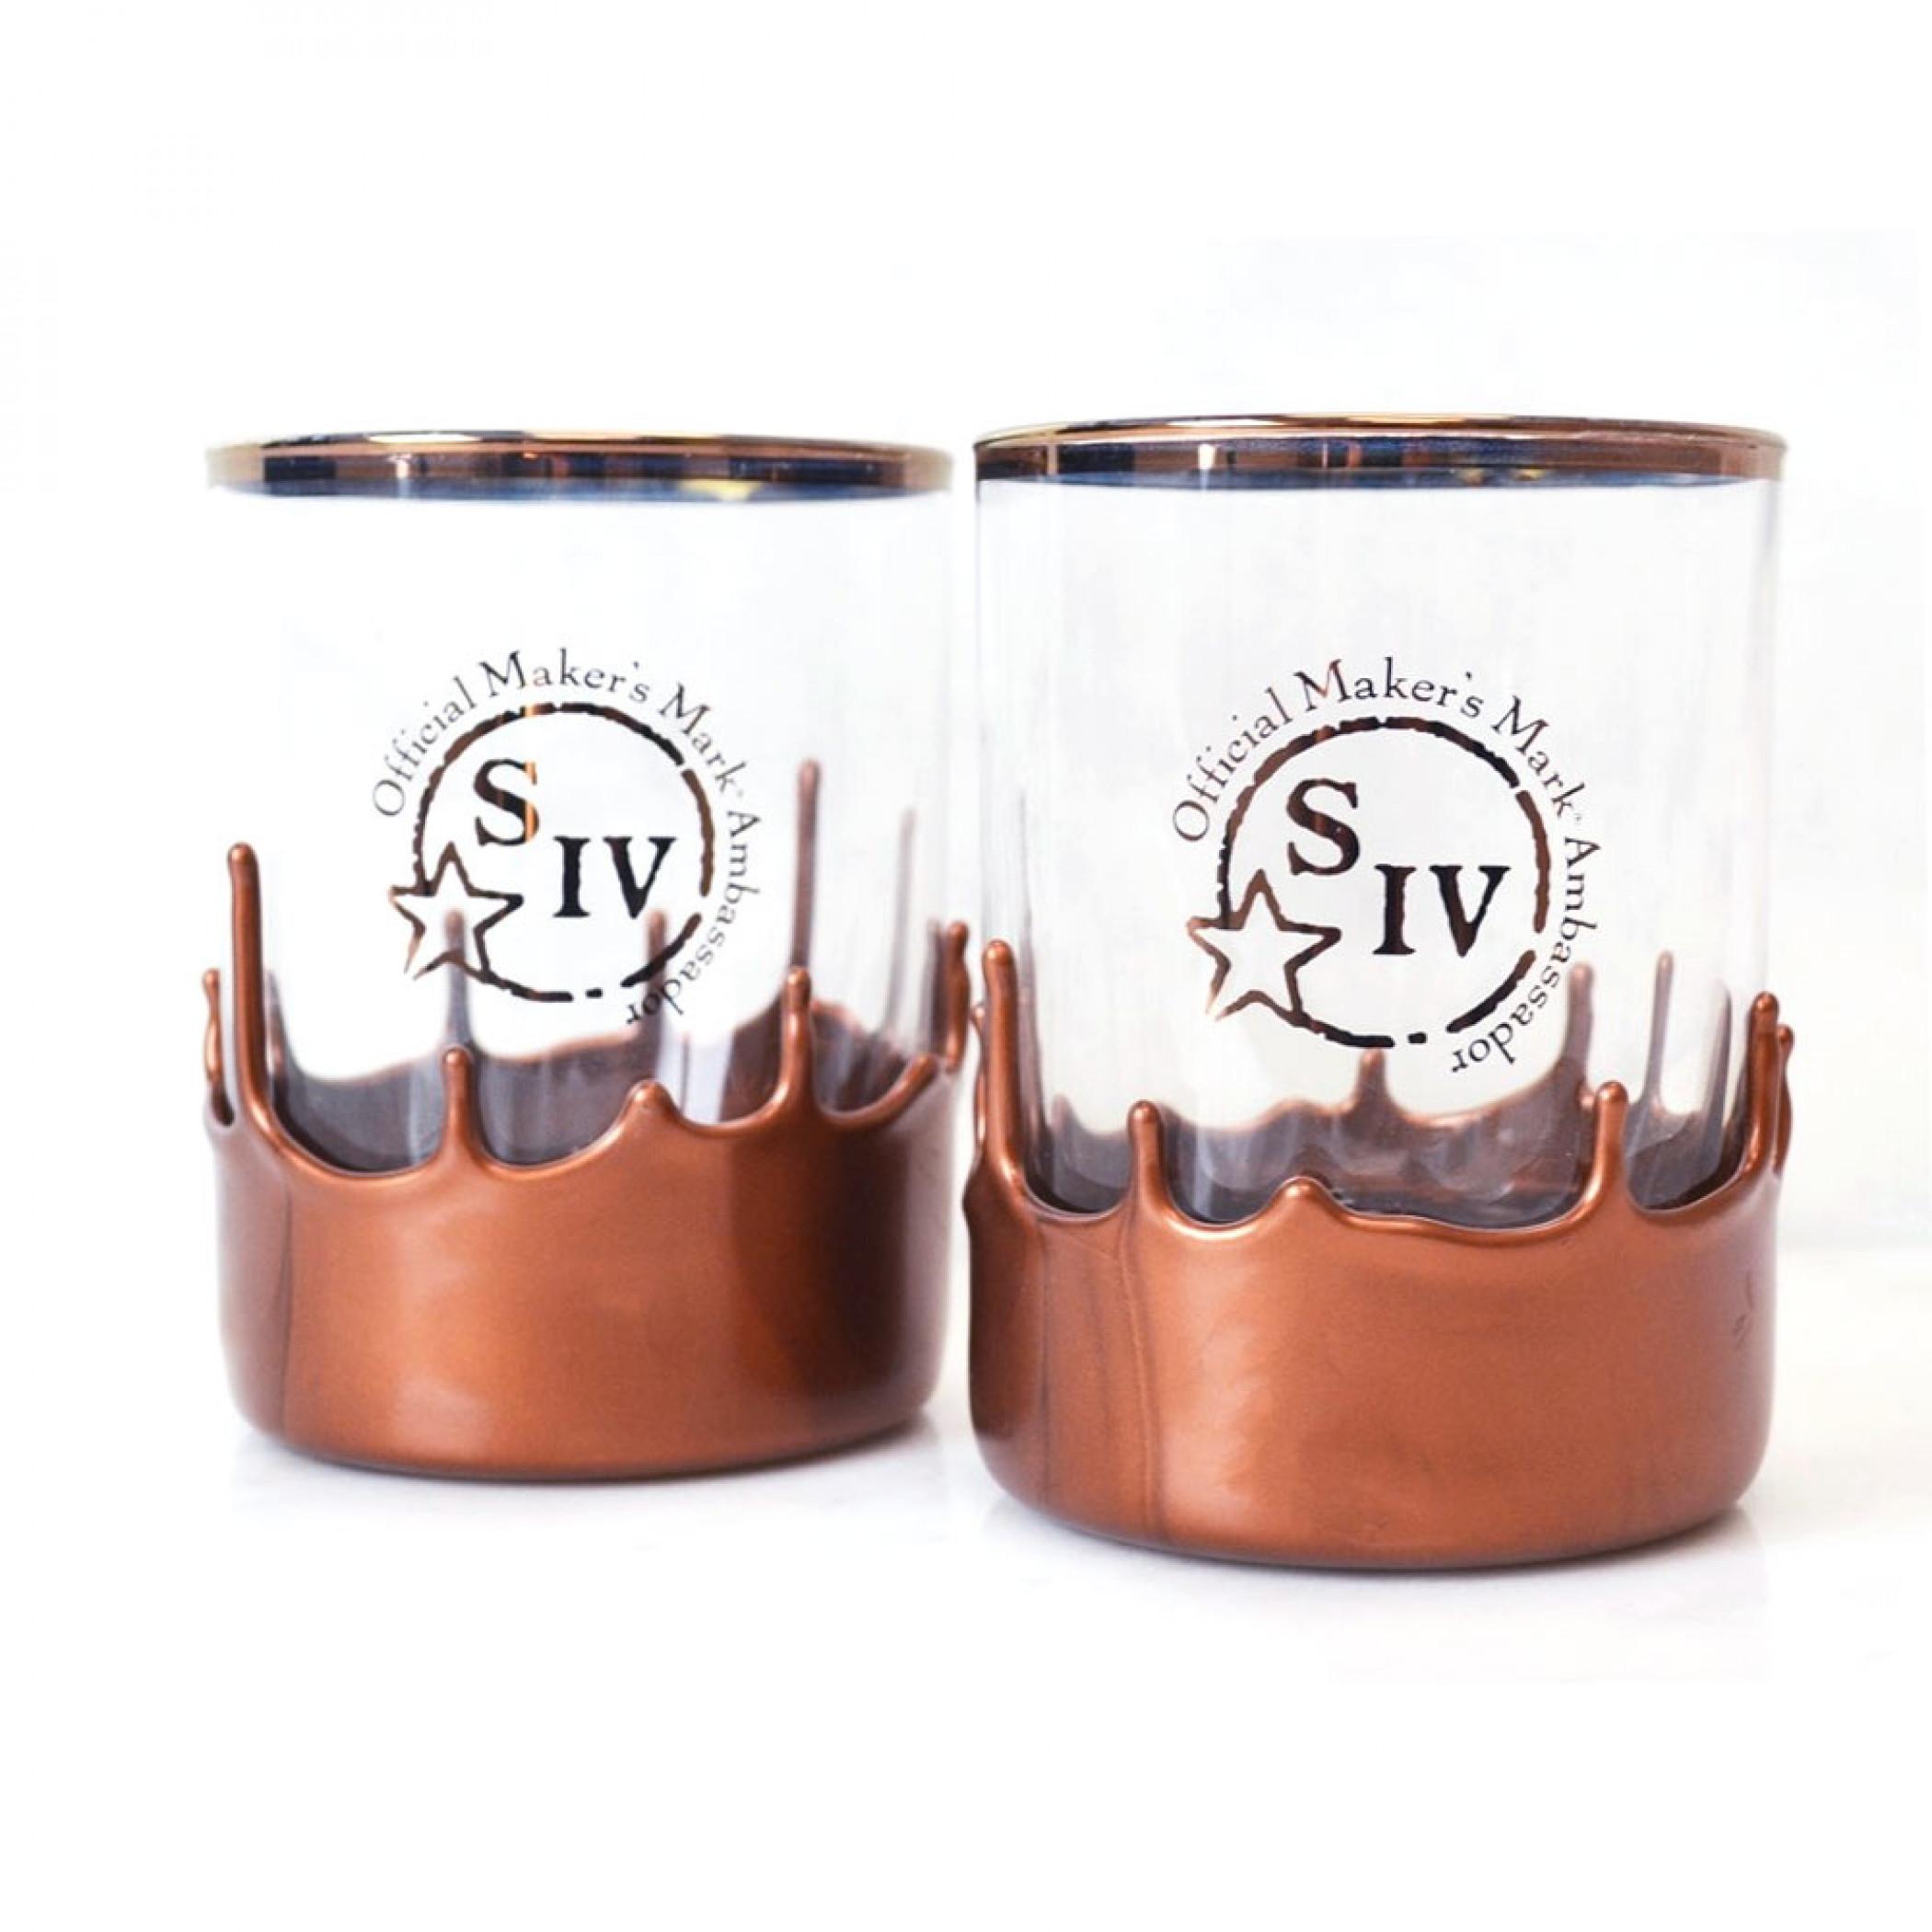 Makers Mark Ambassadors Copper Dipped Glasses Set